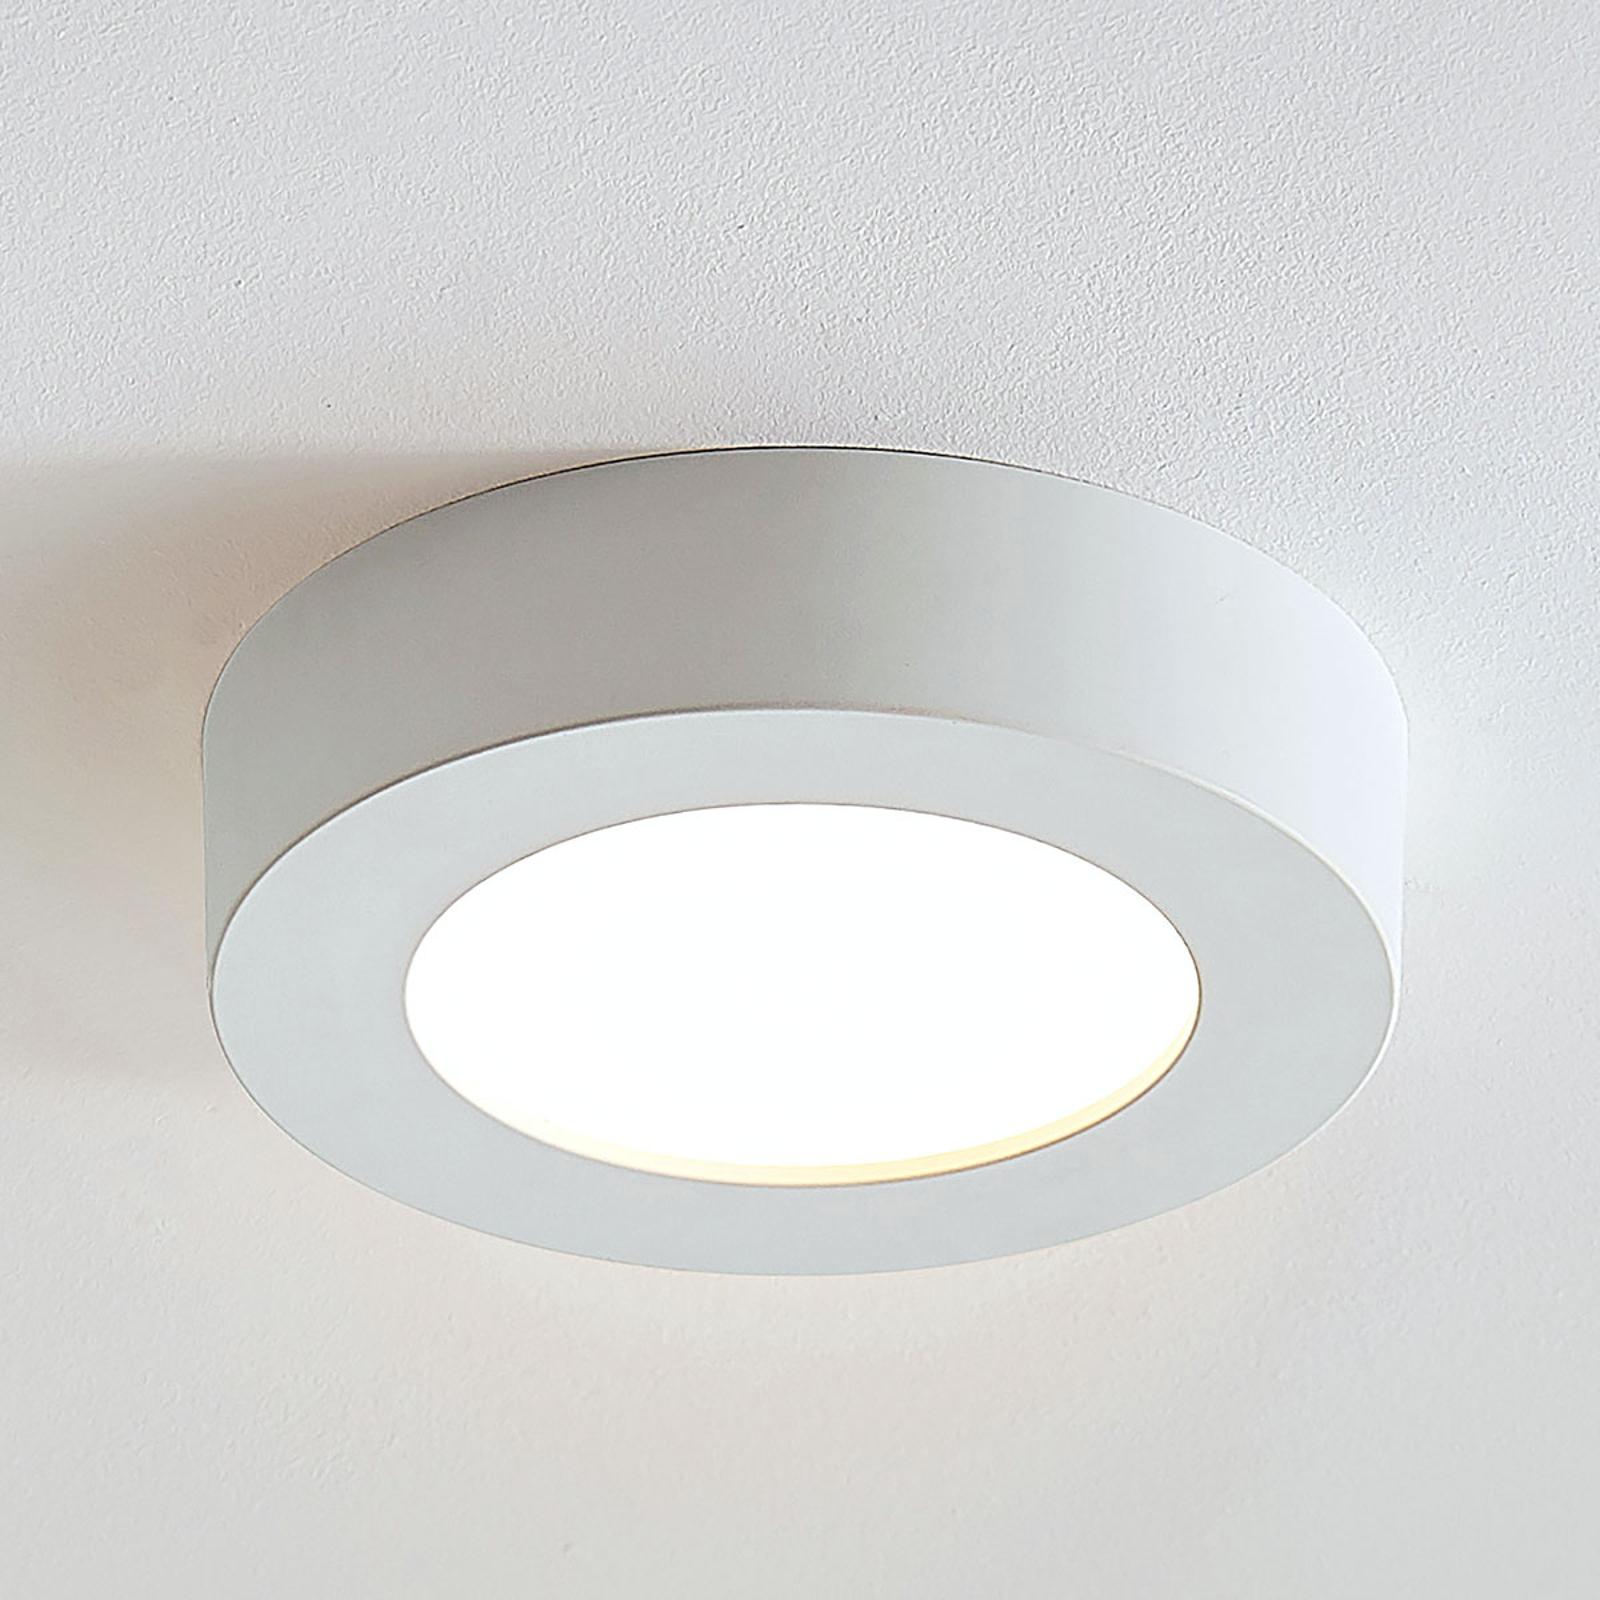 Lampa LED Marlo biała 3000K okrągła 18,2cm